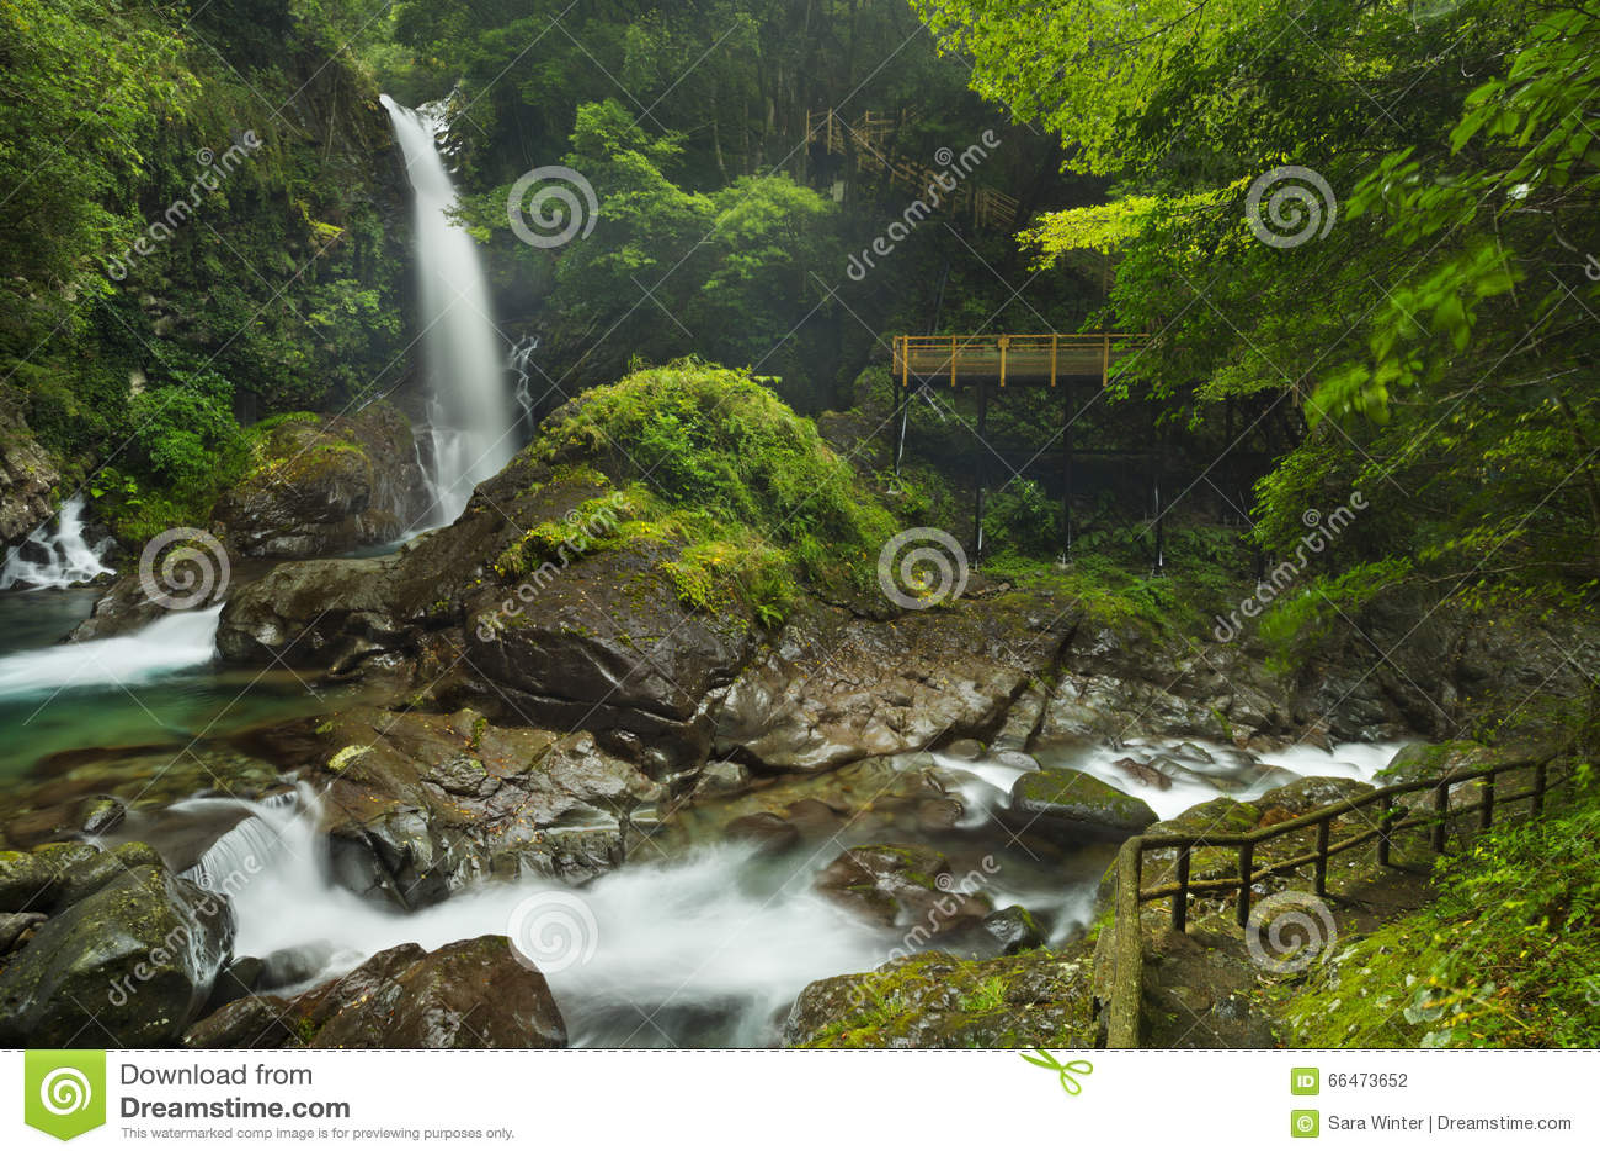 Kawazu waterfall trail, Izu Peninsula, Japan